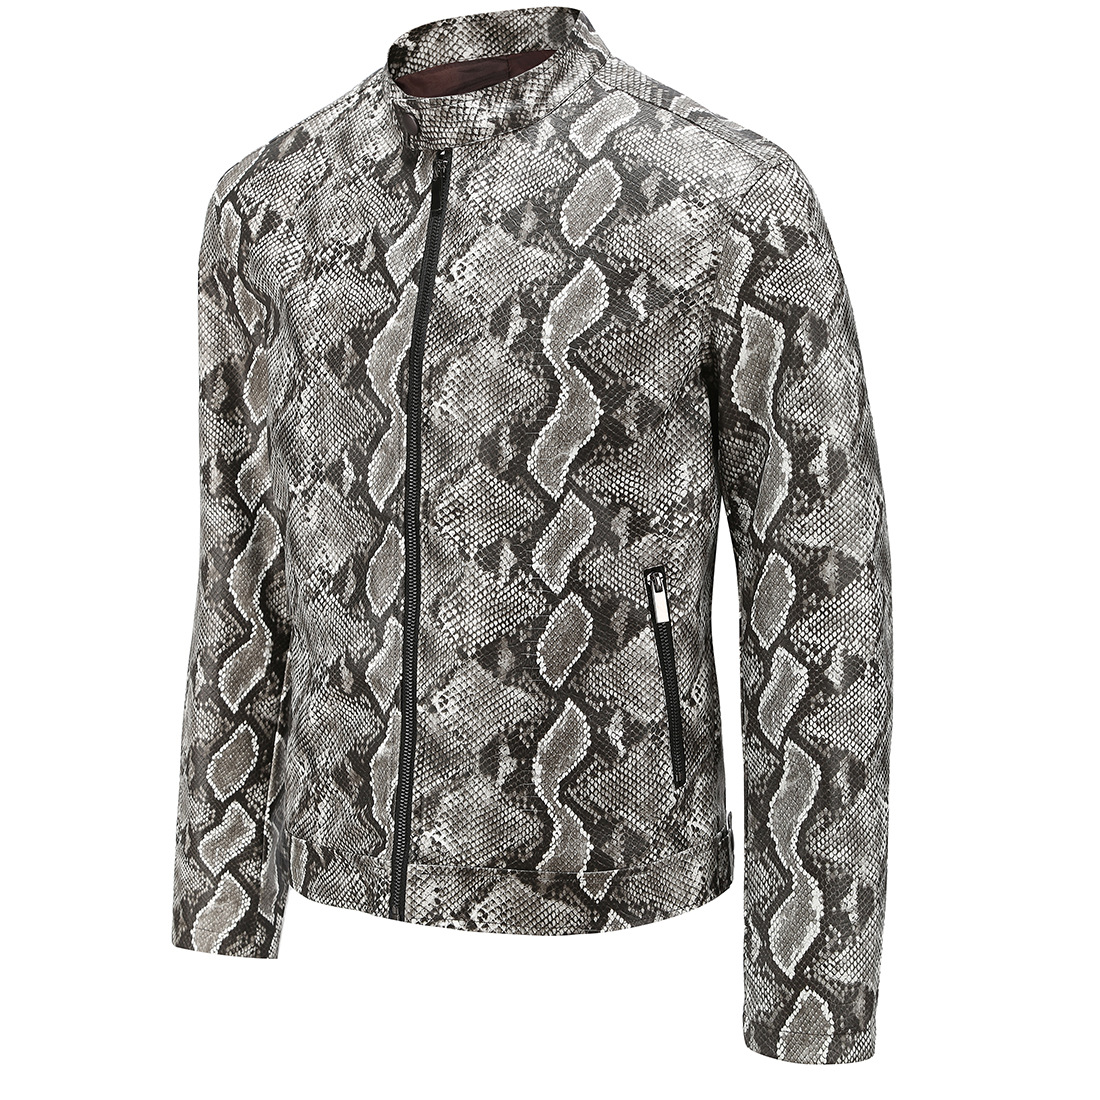 2019 Autumn New Style Foreign Trade Ouma Washing PU Leather Snakeskin Print MEN'S Leather Jacket Coat PY002